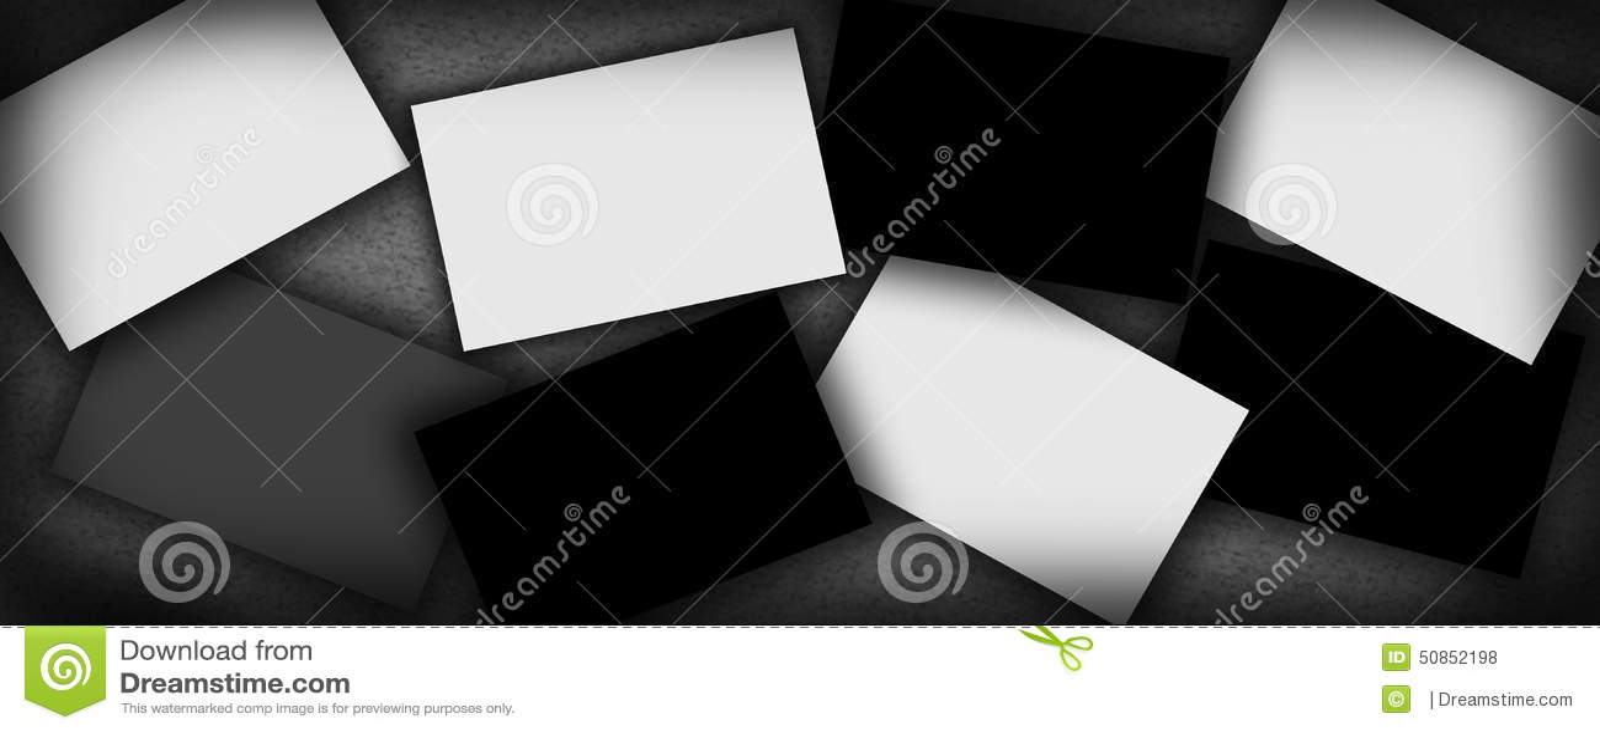 Шаблон для ваших изображений, портфолио картин